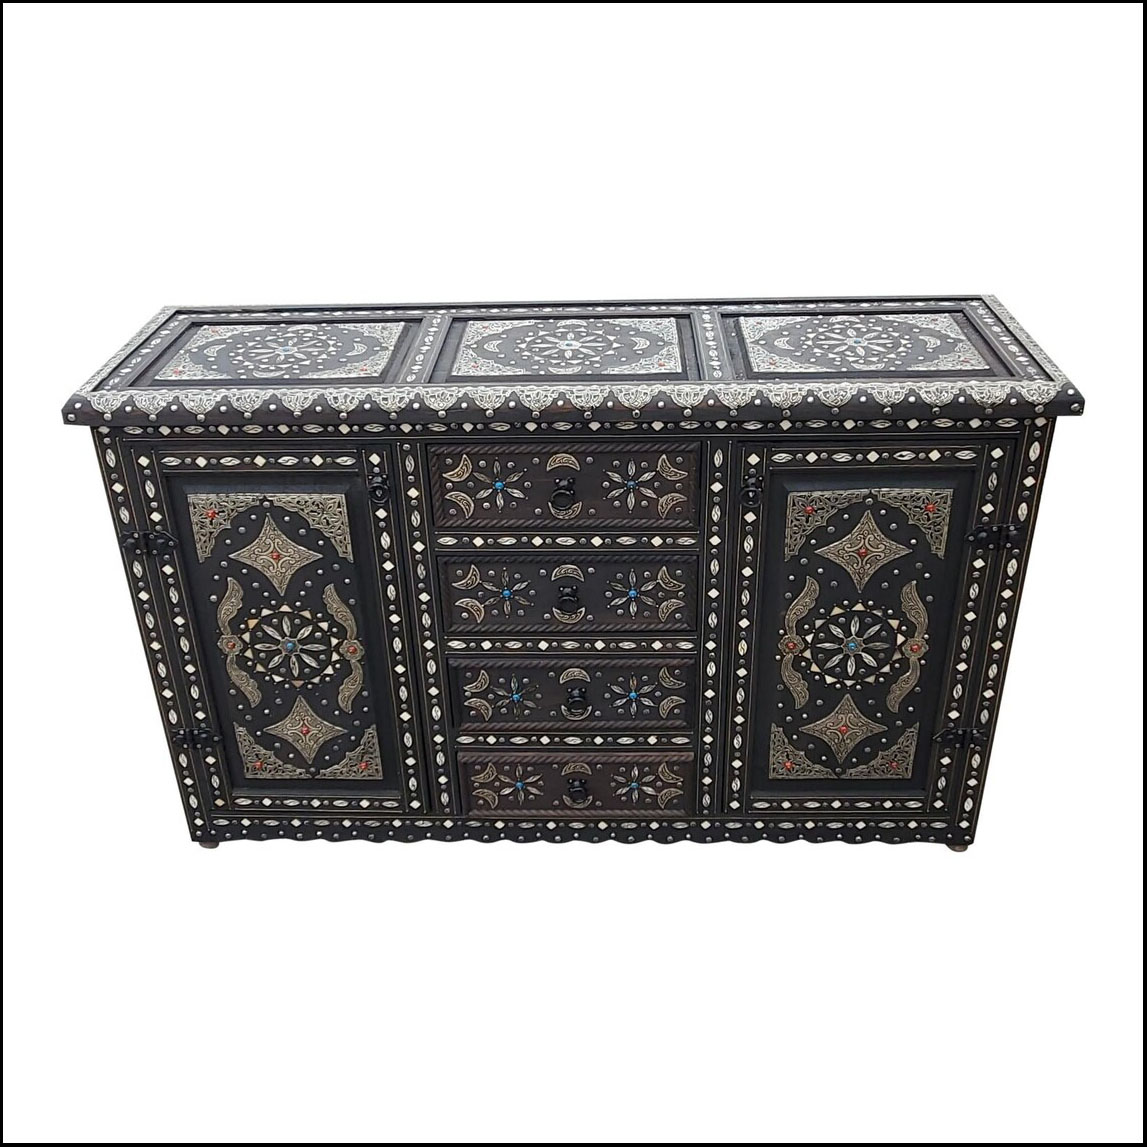 Cedar Wood Moroccan Cabinet, Bone and Metal Inlay